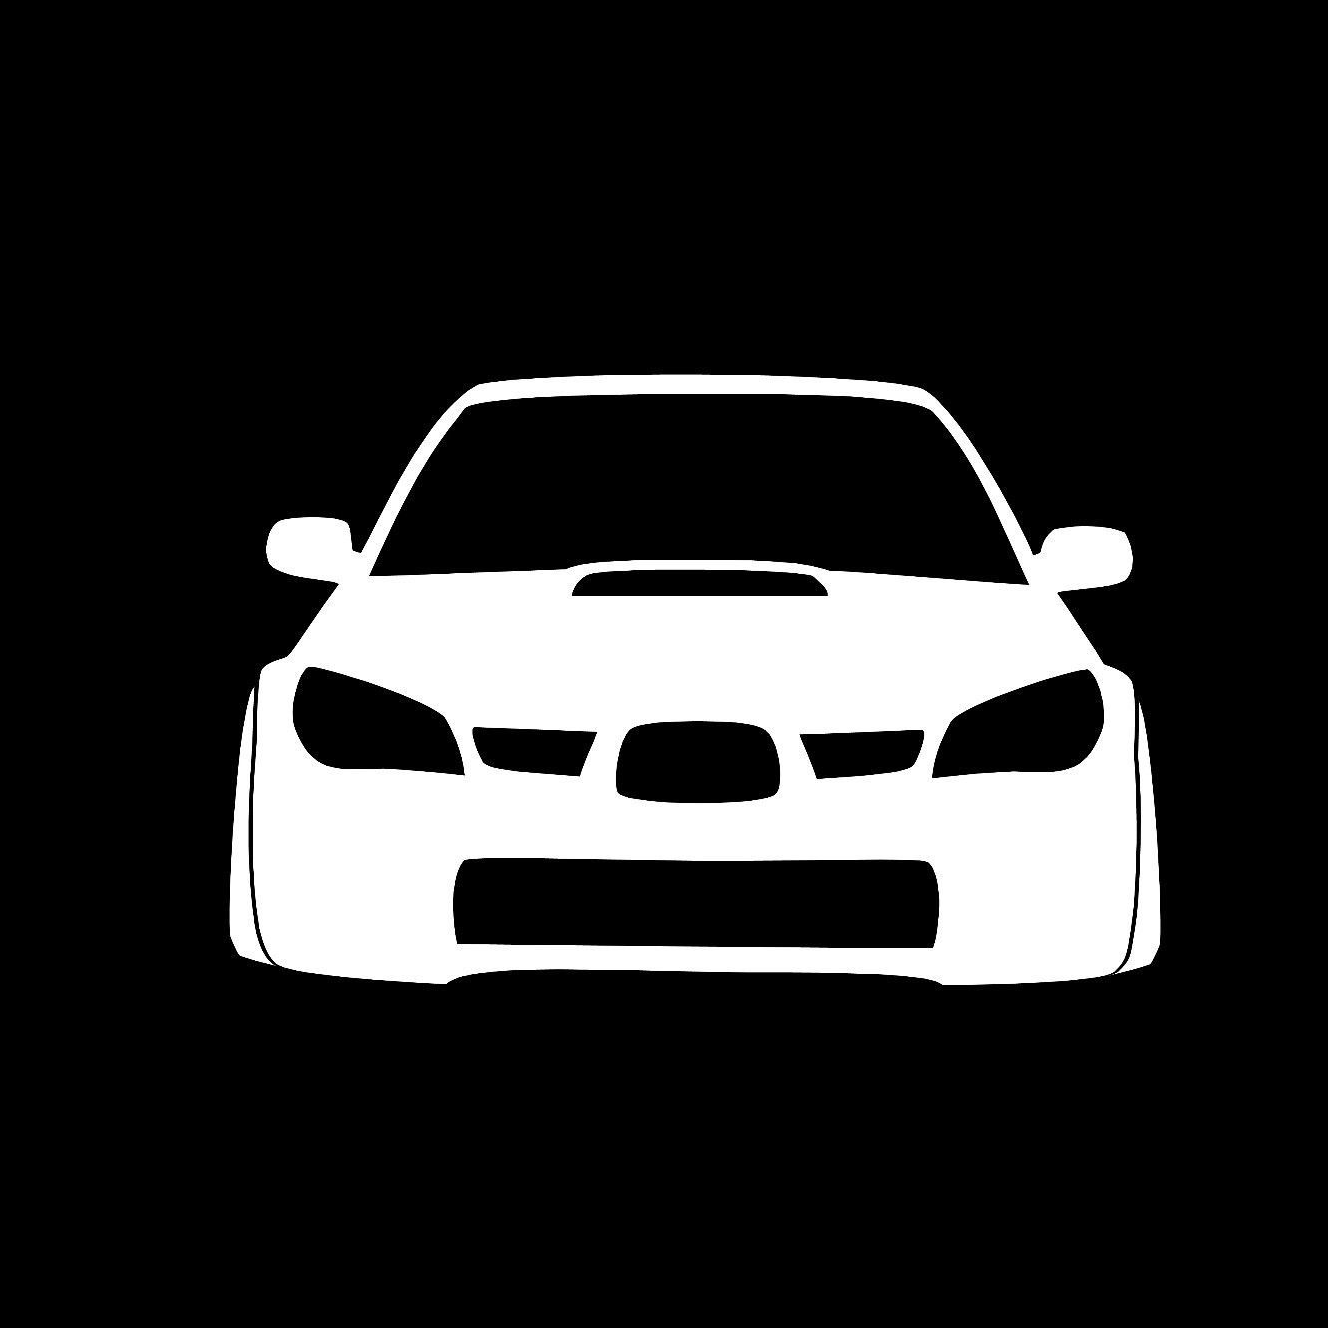 SubaruAmbassador